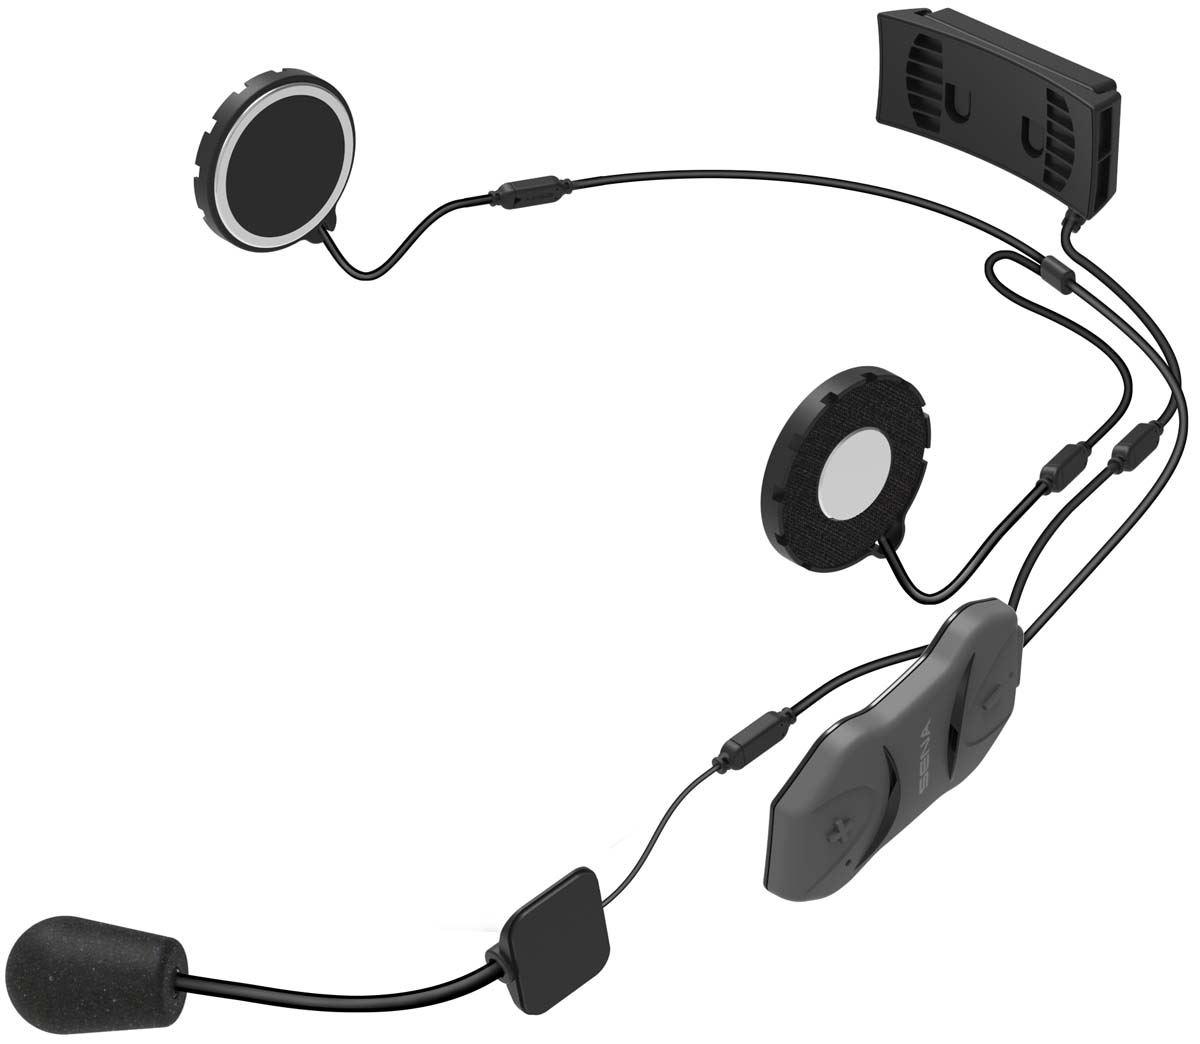 Sena Bluetooth 10R Low Profile Motorcycle Bluetooth Communication System